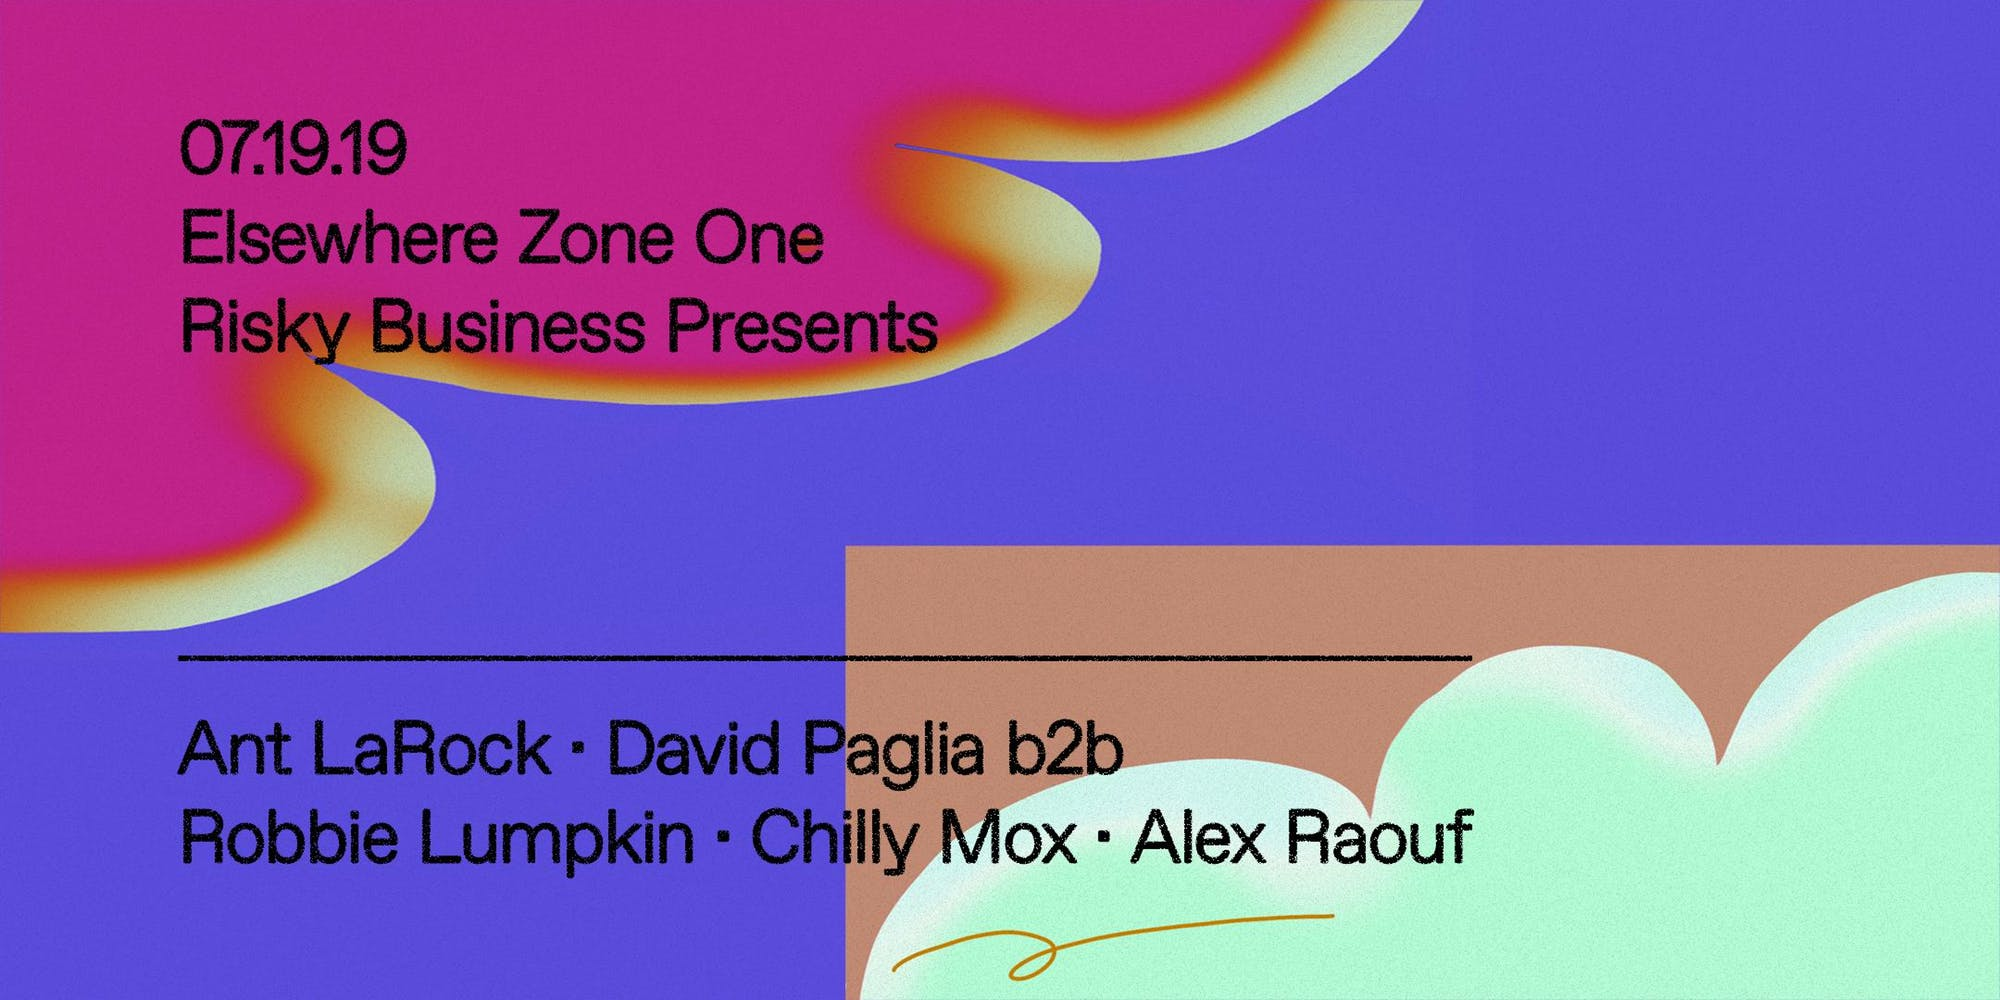 Ant LaRock David Paglia B2B Robbie Lumpkin Chilly Mox & Alex Rouf elsehwhere risky business robbie lumpkin promotions